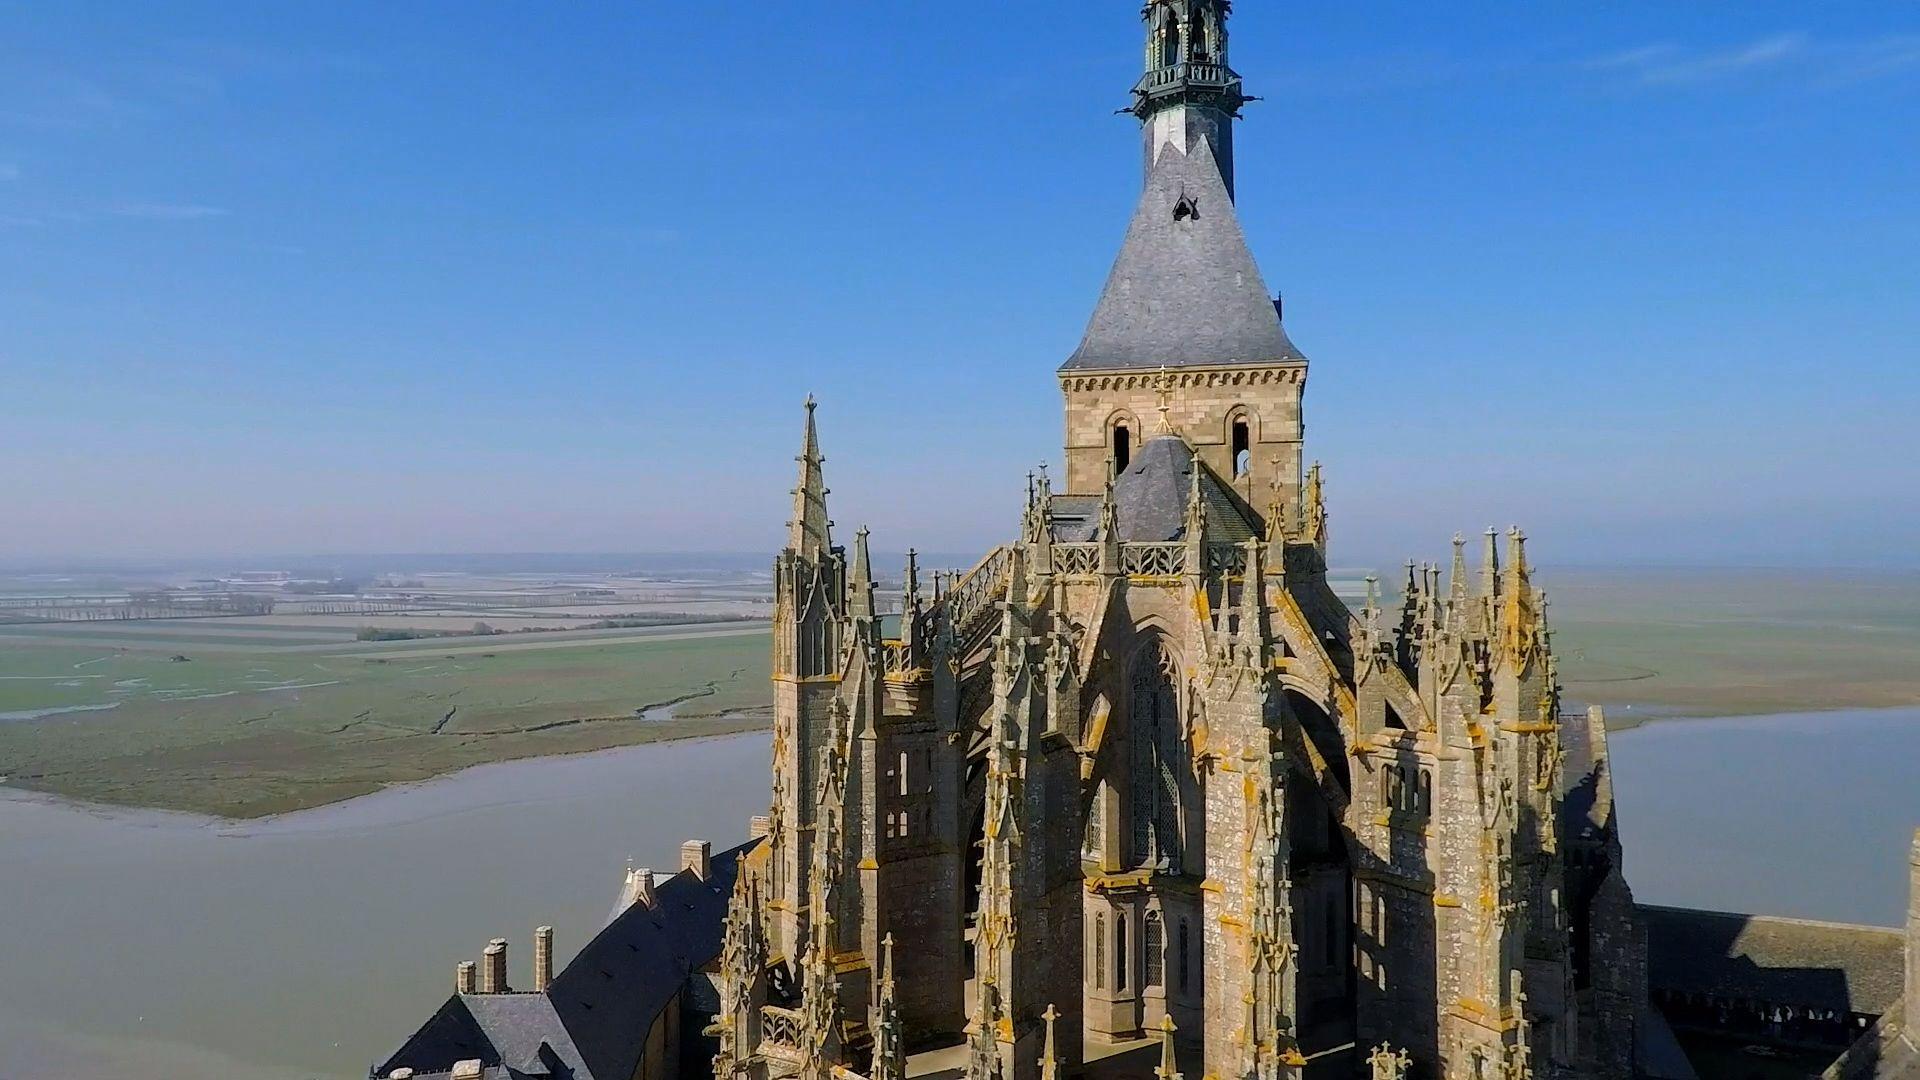 Entdeckt 22 uralte Heiligtümer in Europa